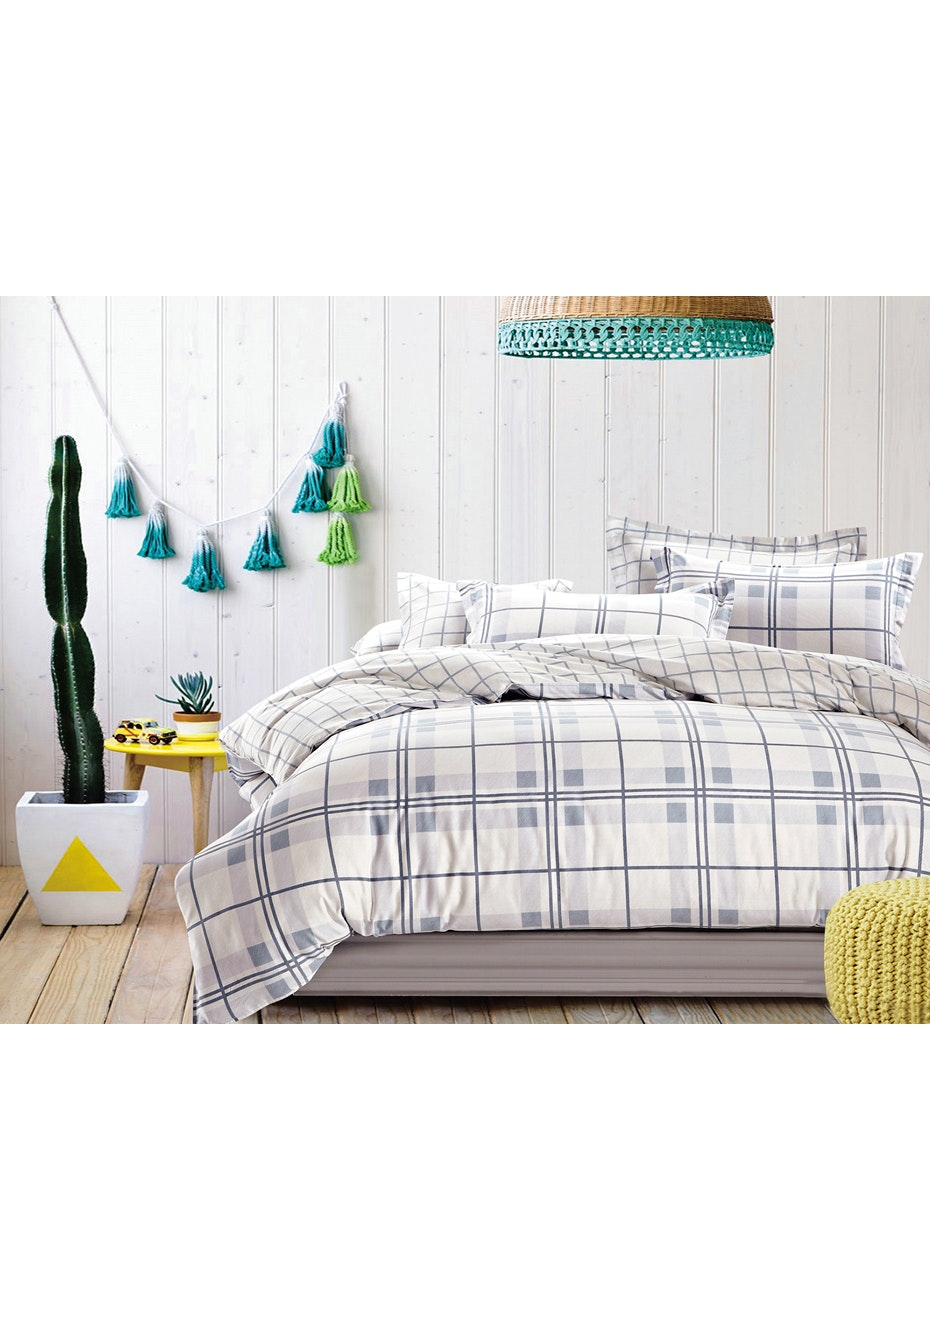 Coby Quilt Cover Set - Queen Bed - Reversible Design